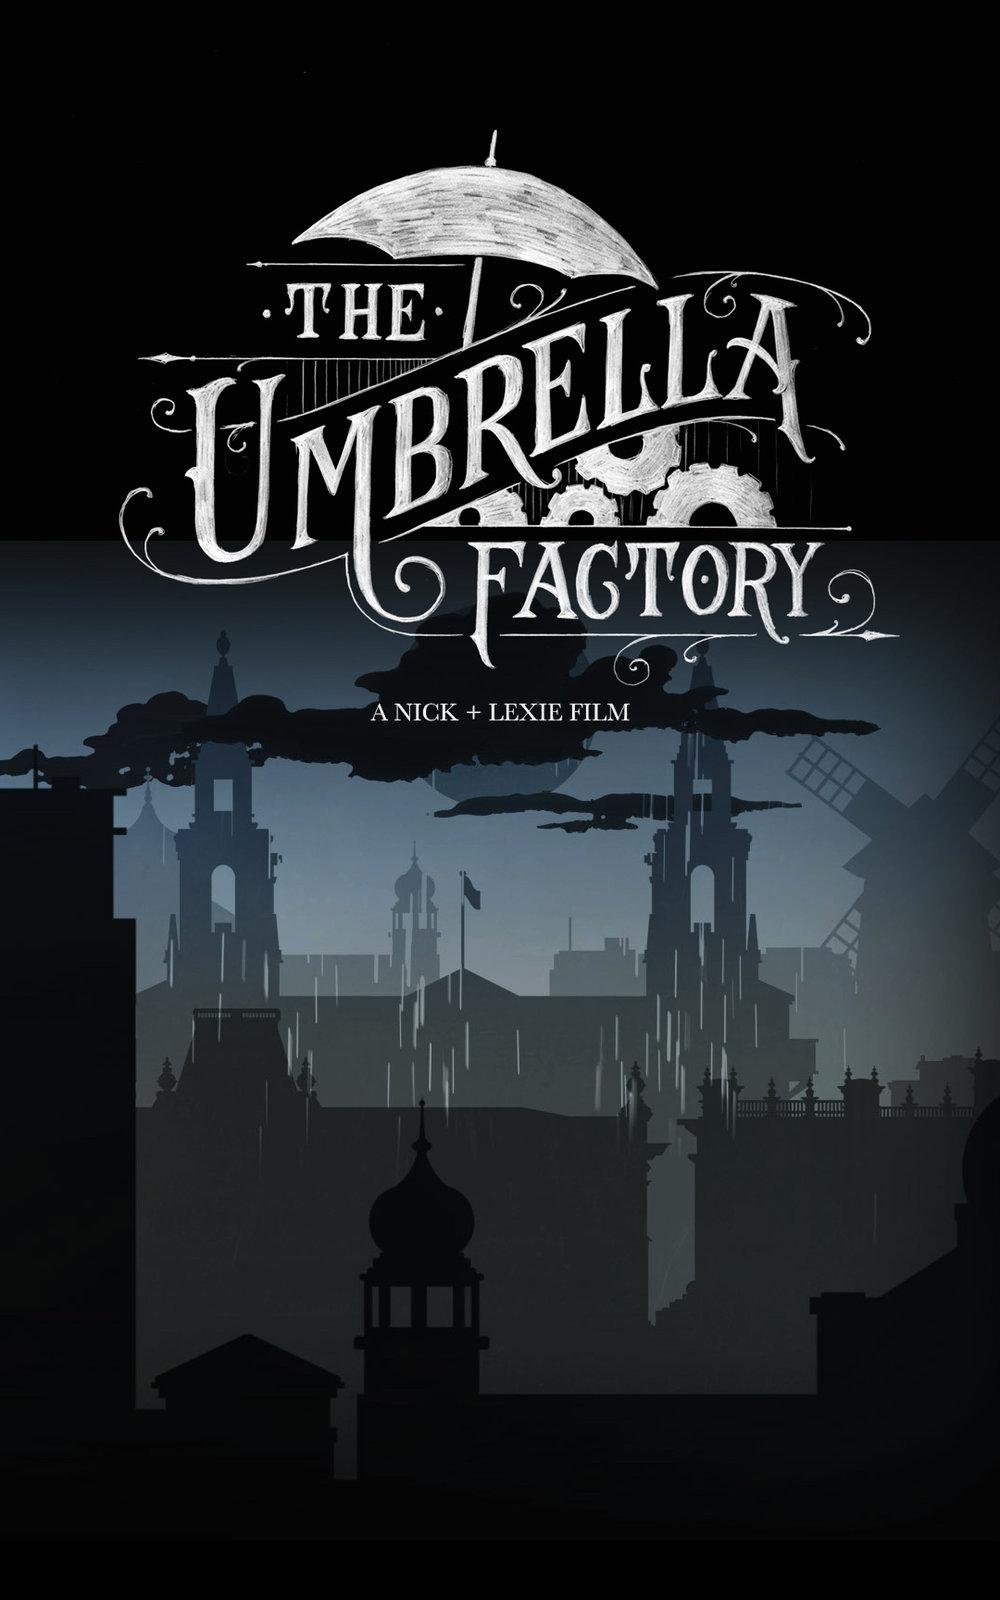 The Umbrella Factory, Short Film